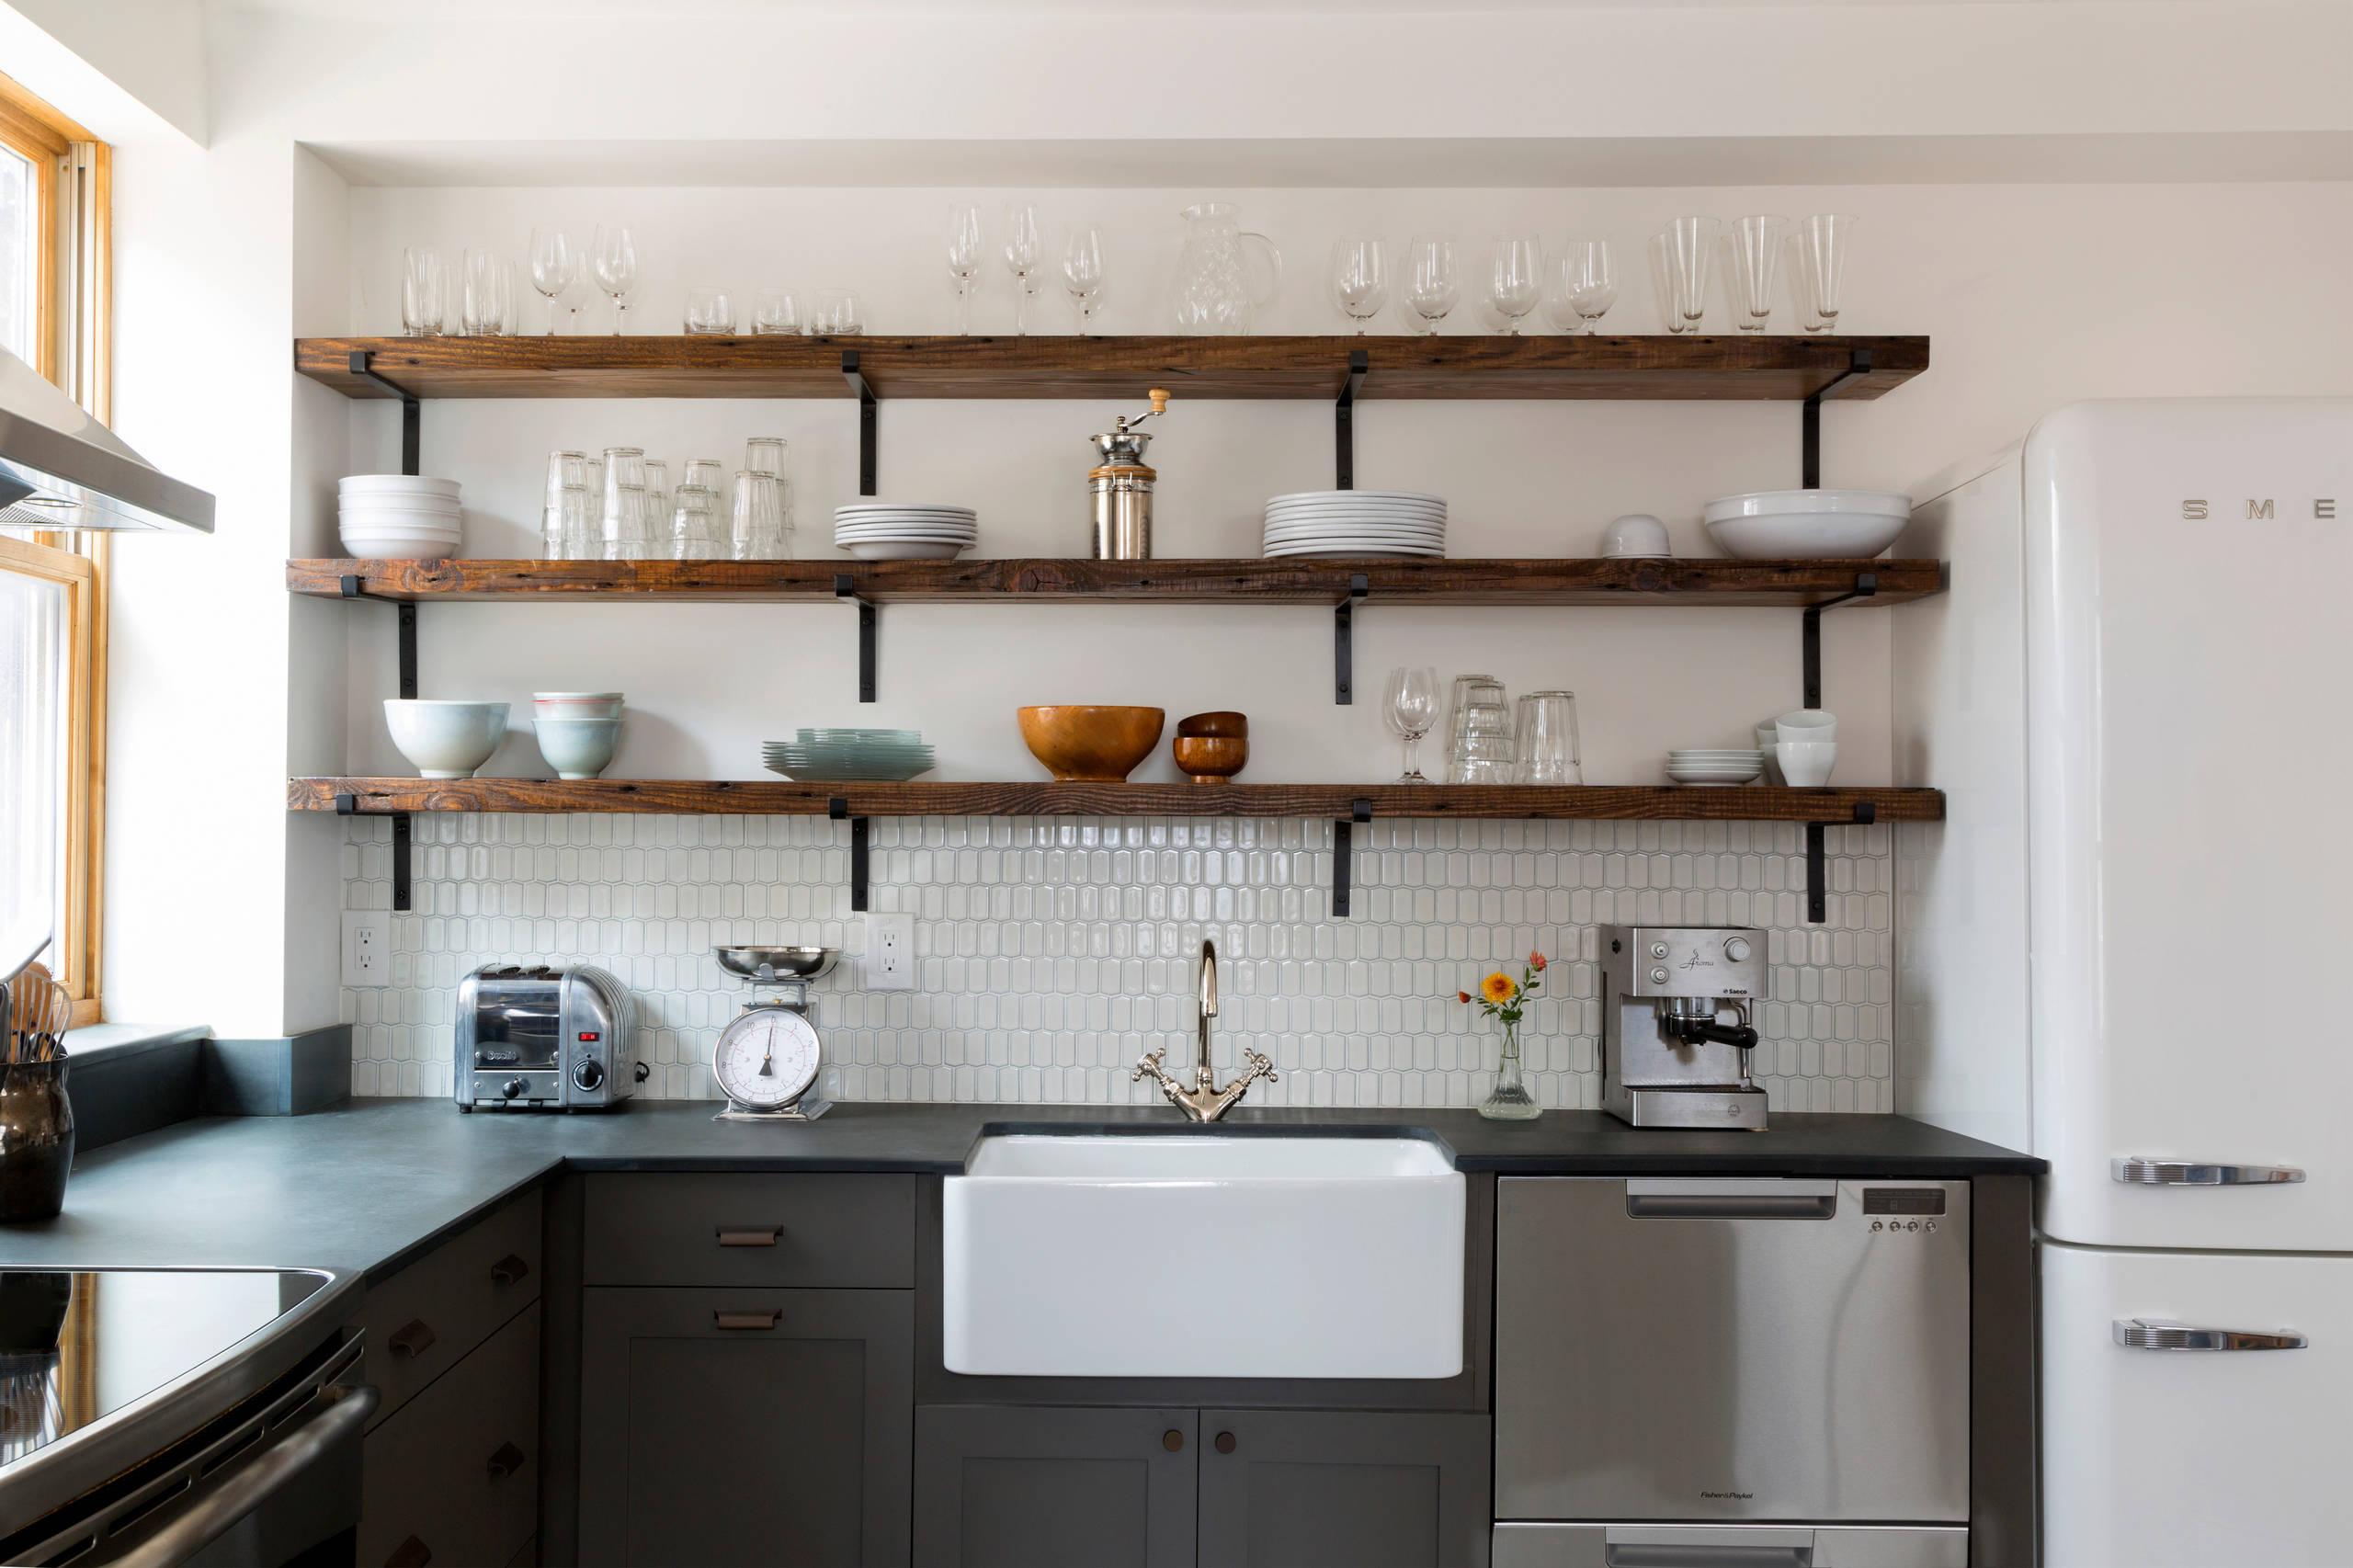 Shelves Under Your Countertop